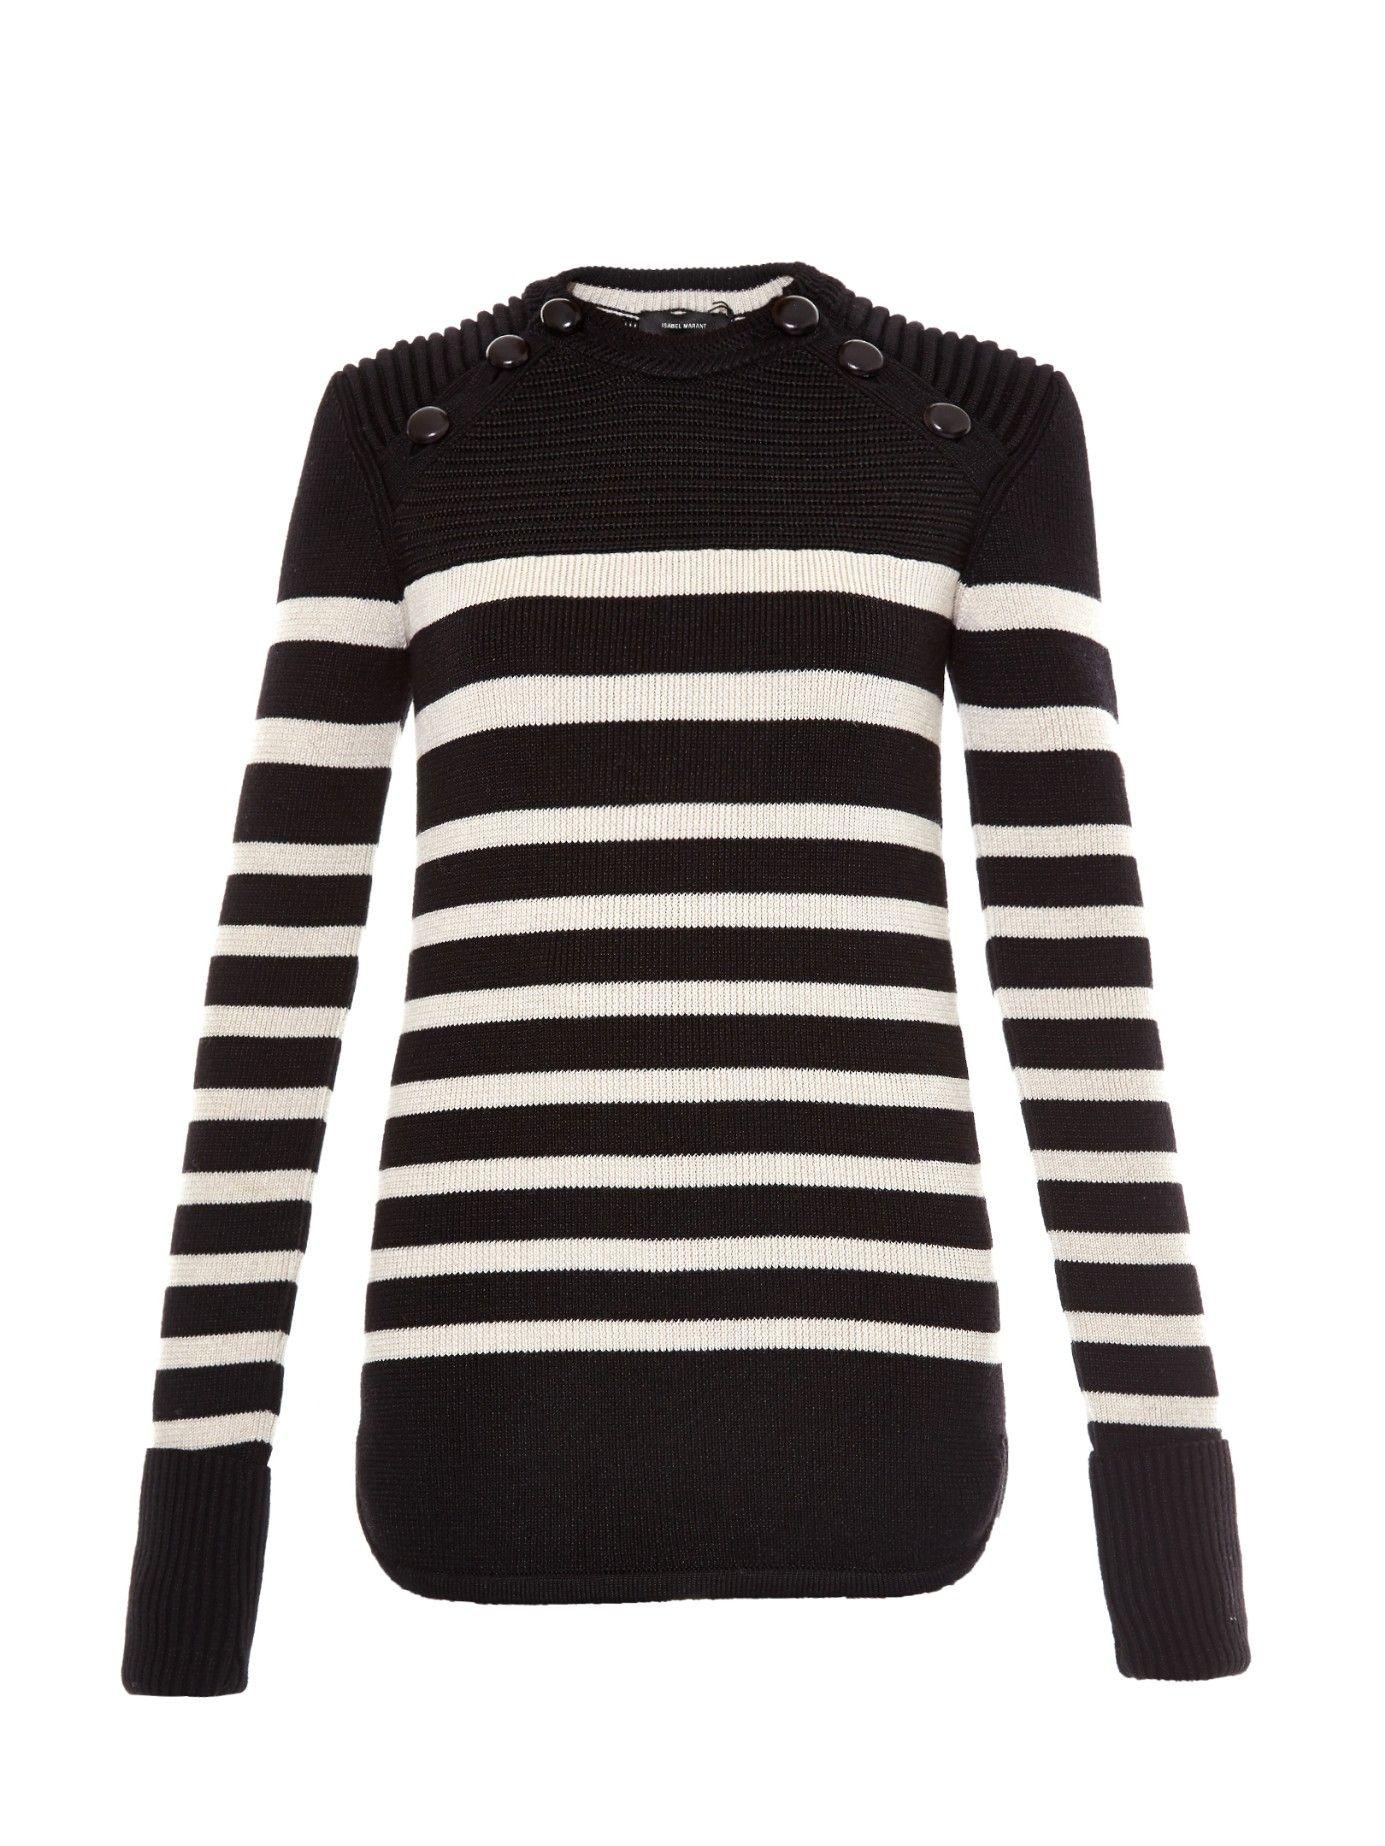 Hayward striped wool-blend knit sweater | Isabel Marant | MATCHESFASHION.COM US